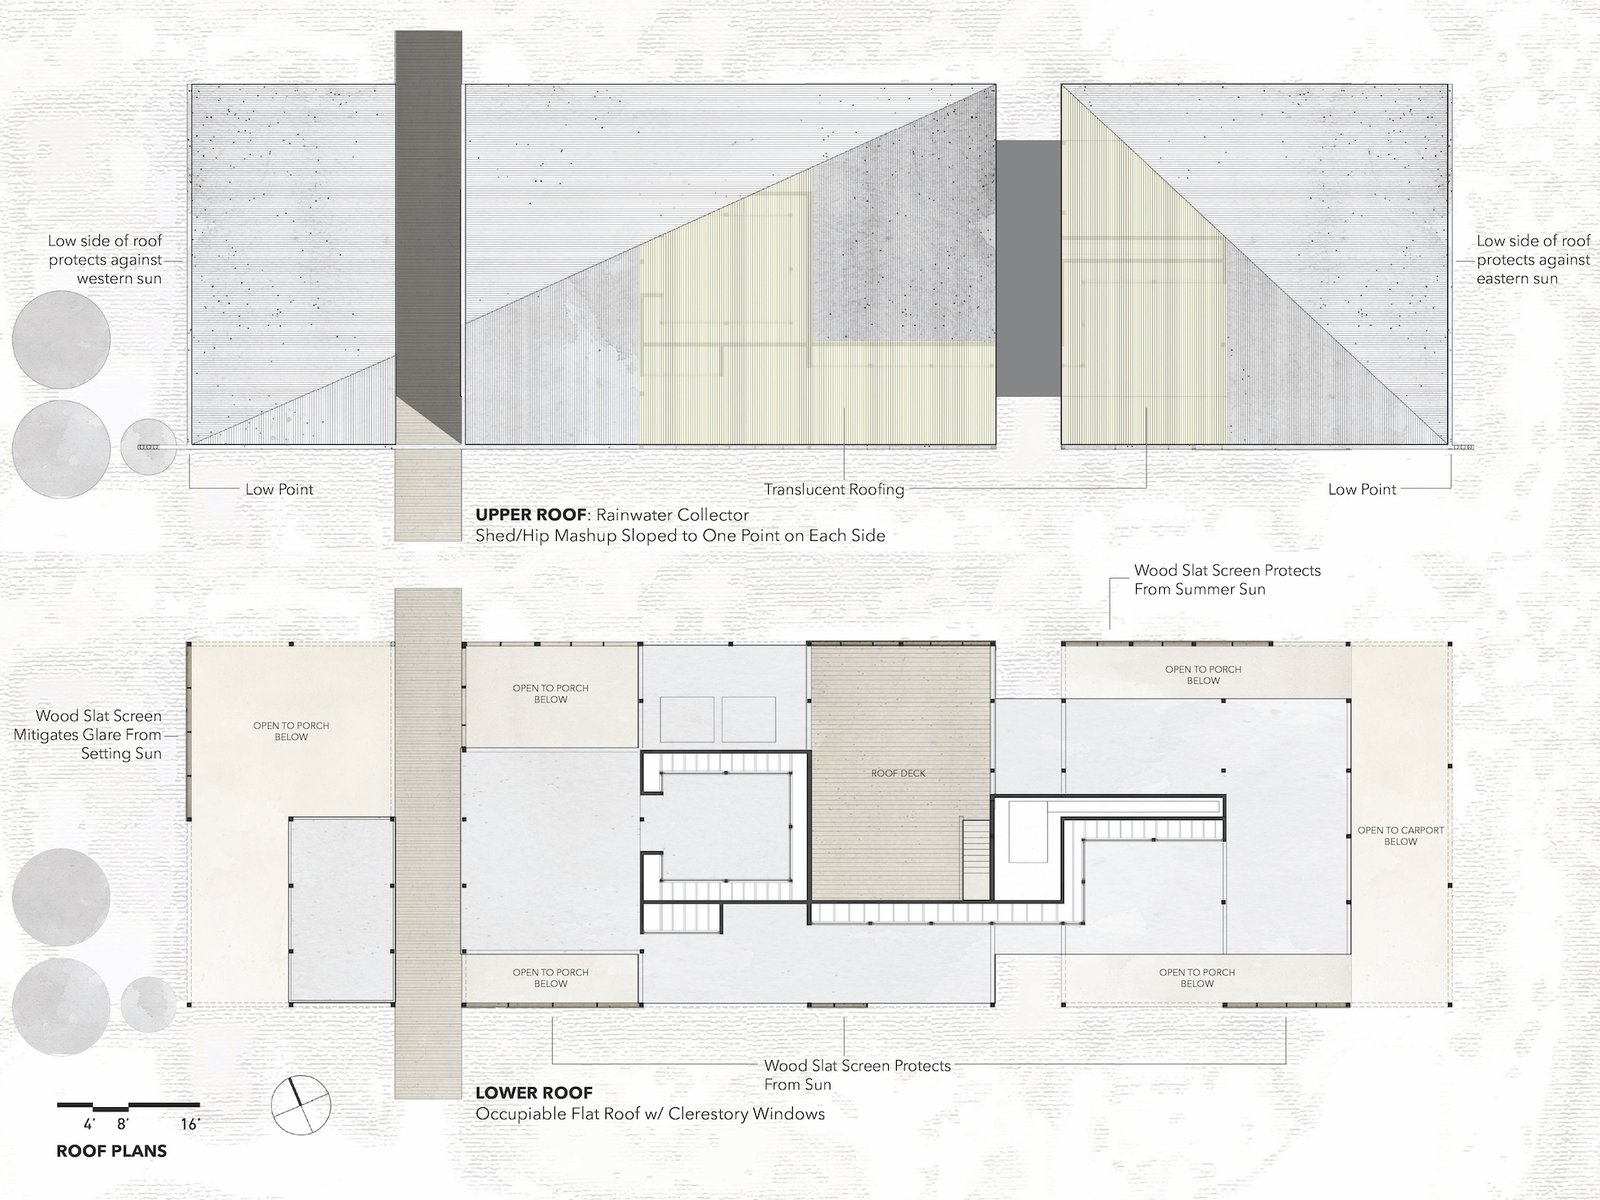 Roof plans of Dakota Mountain Residence by LowDO.